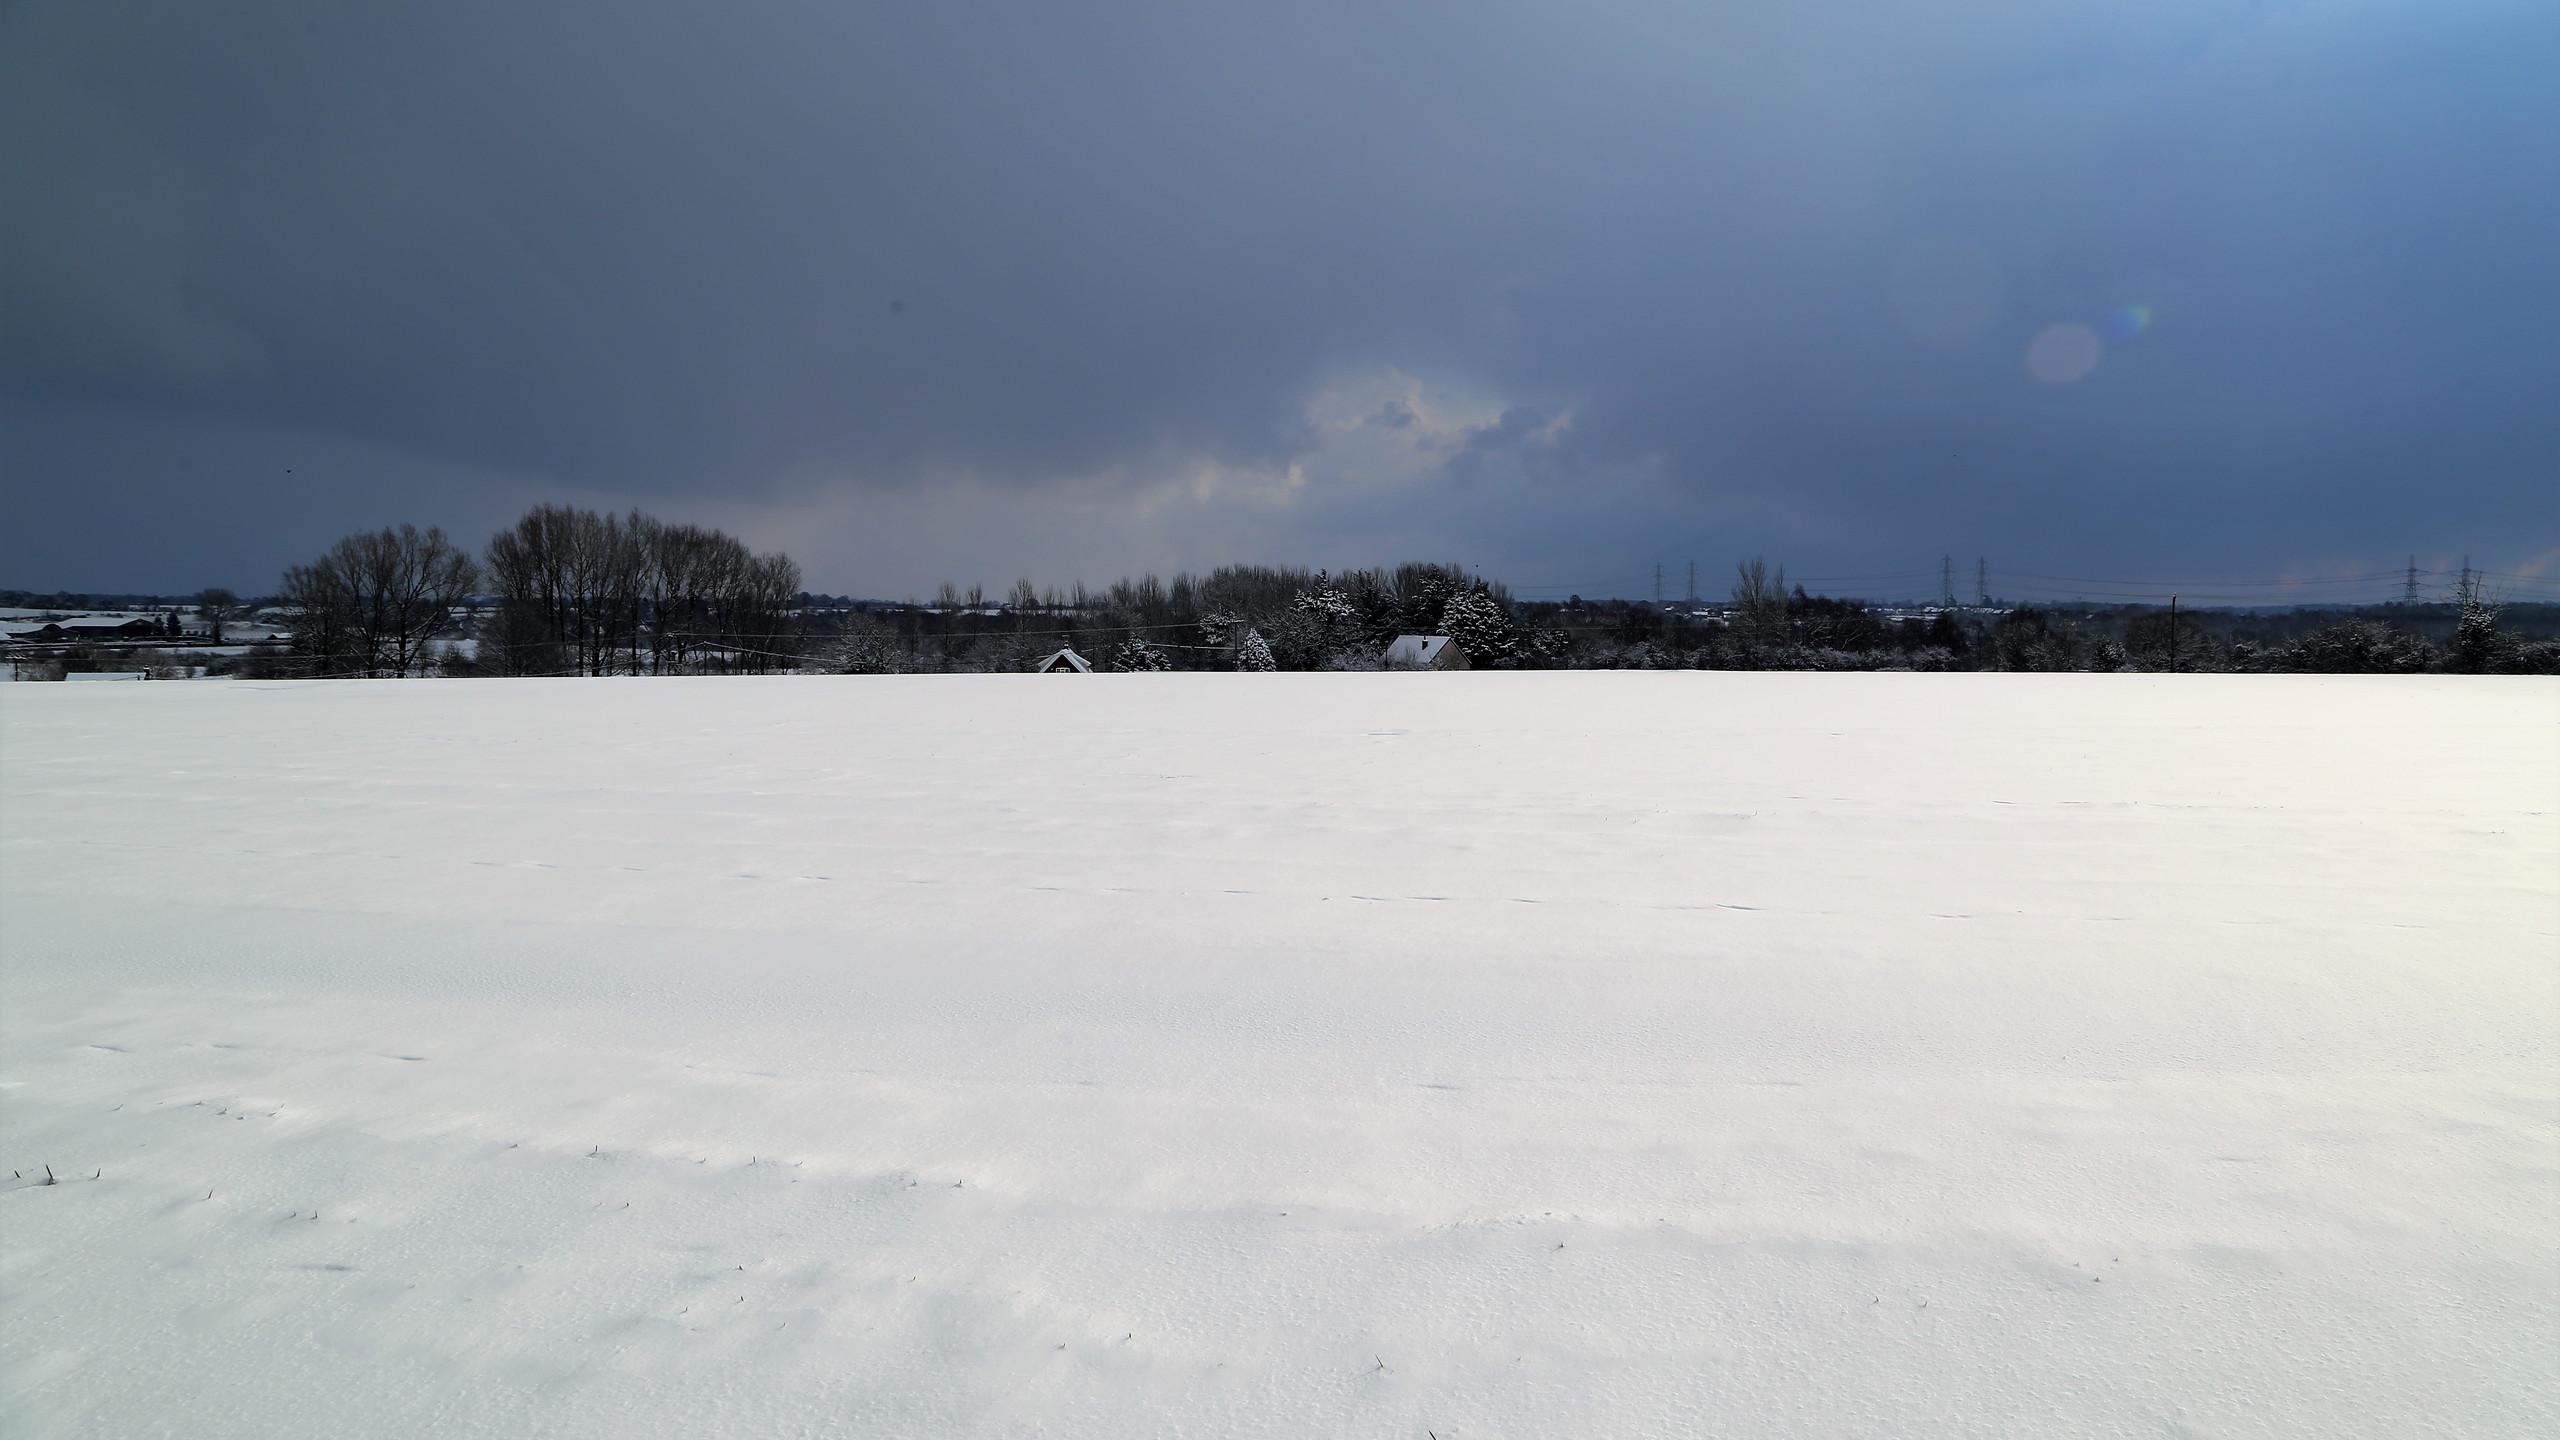 Plenty more snow to come